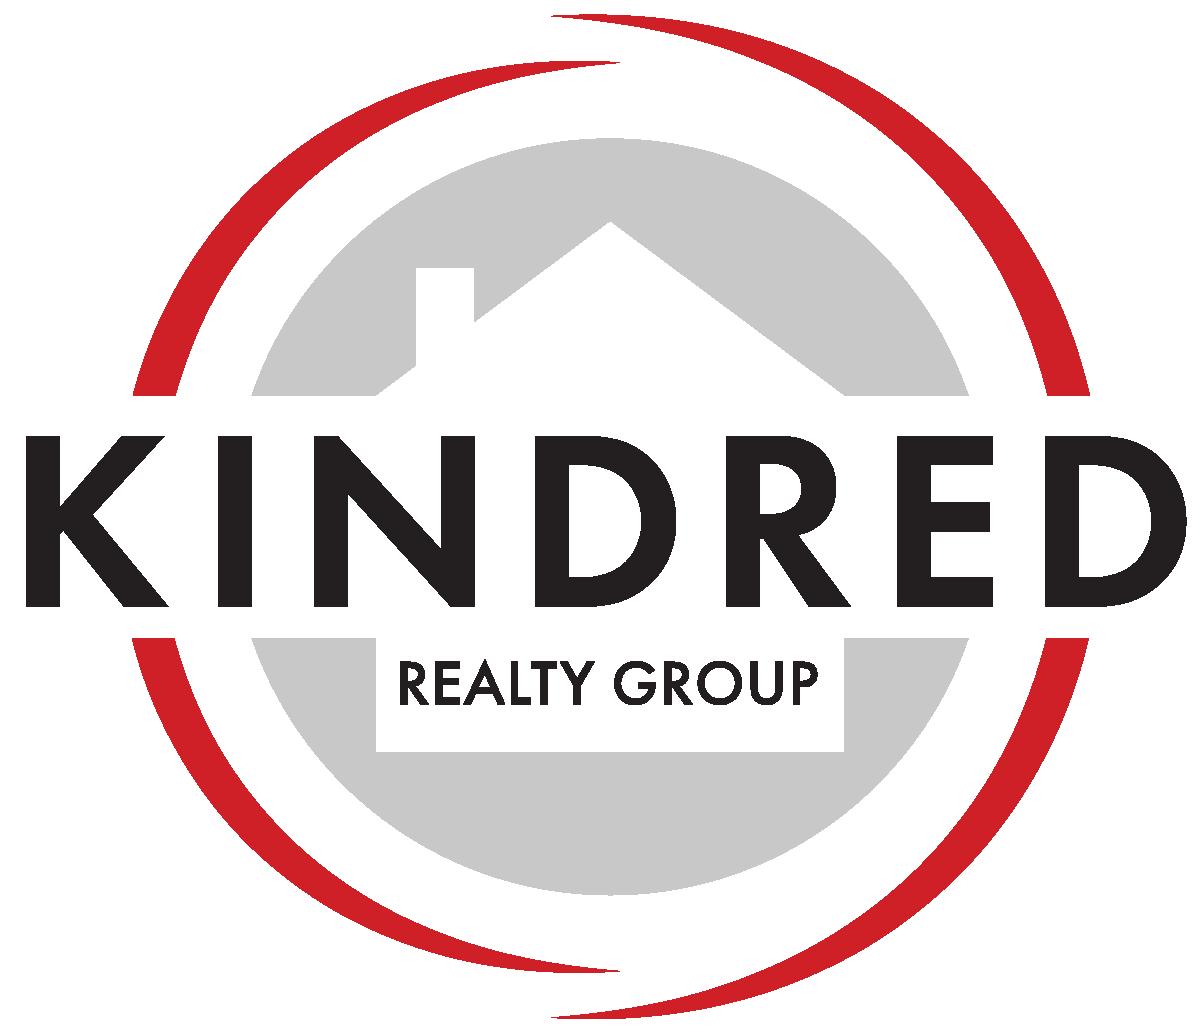 KindredSold.com logo